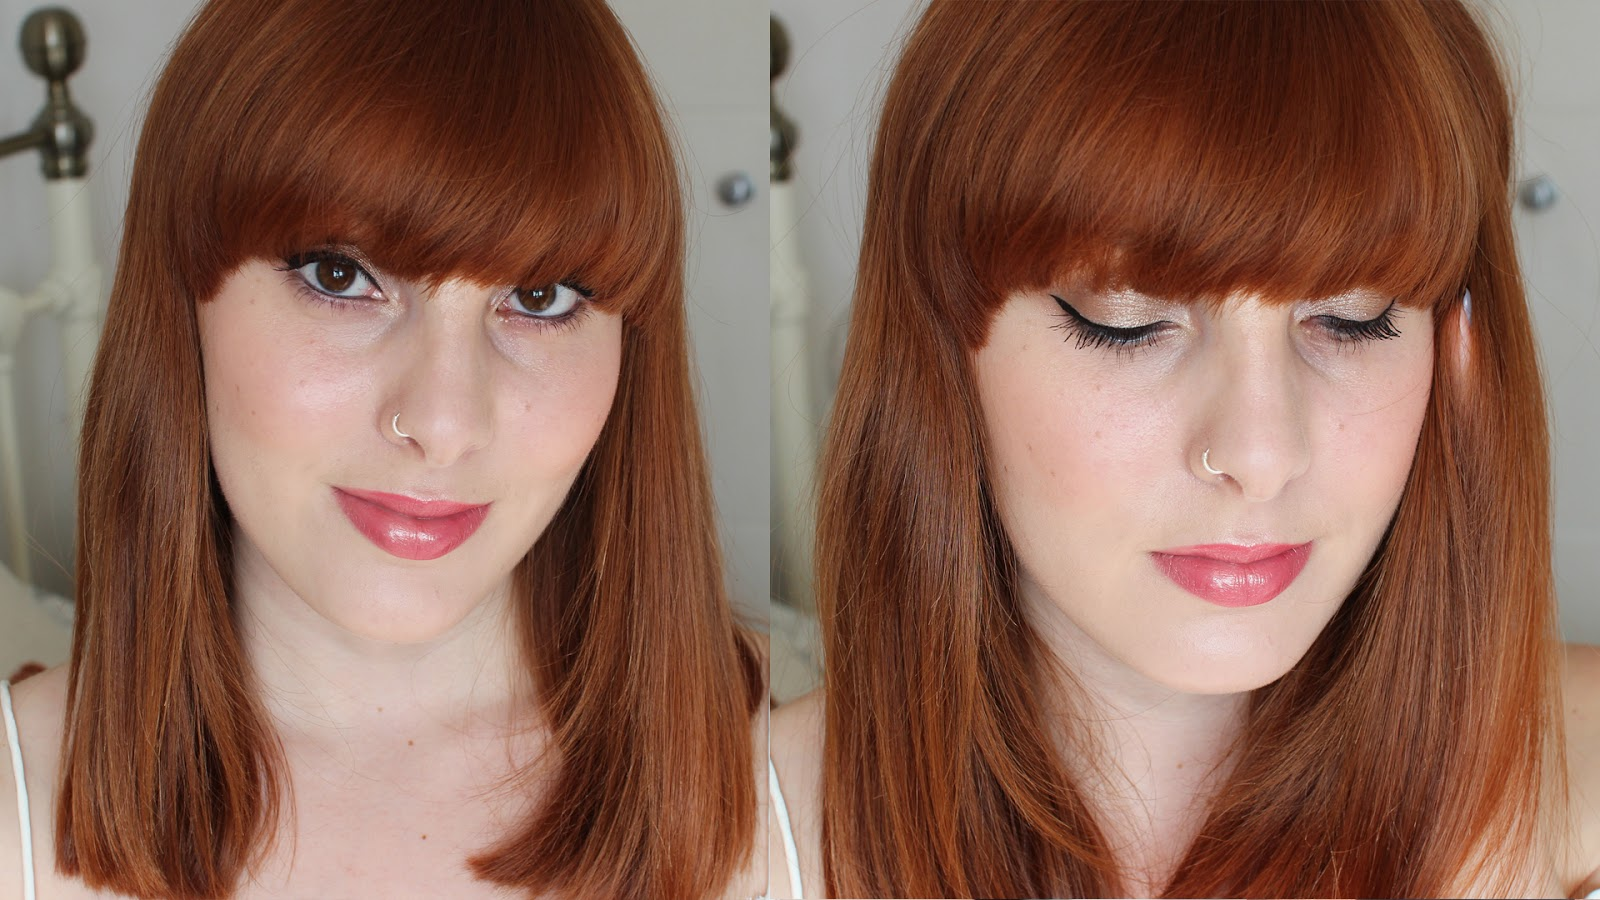 Bridal Makeup For Pale Skin & Brown Eyes